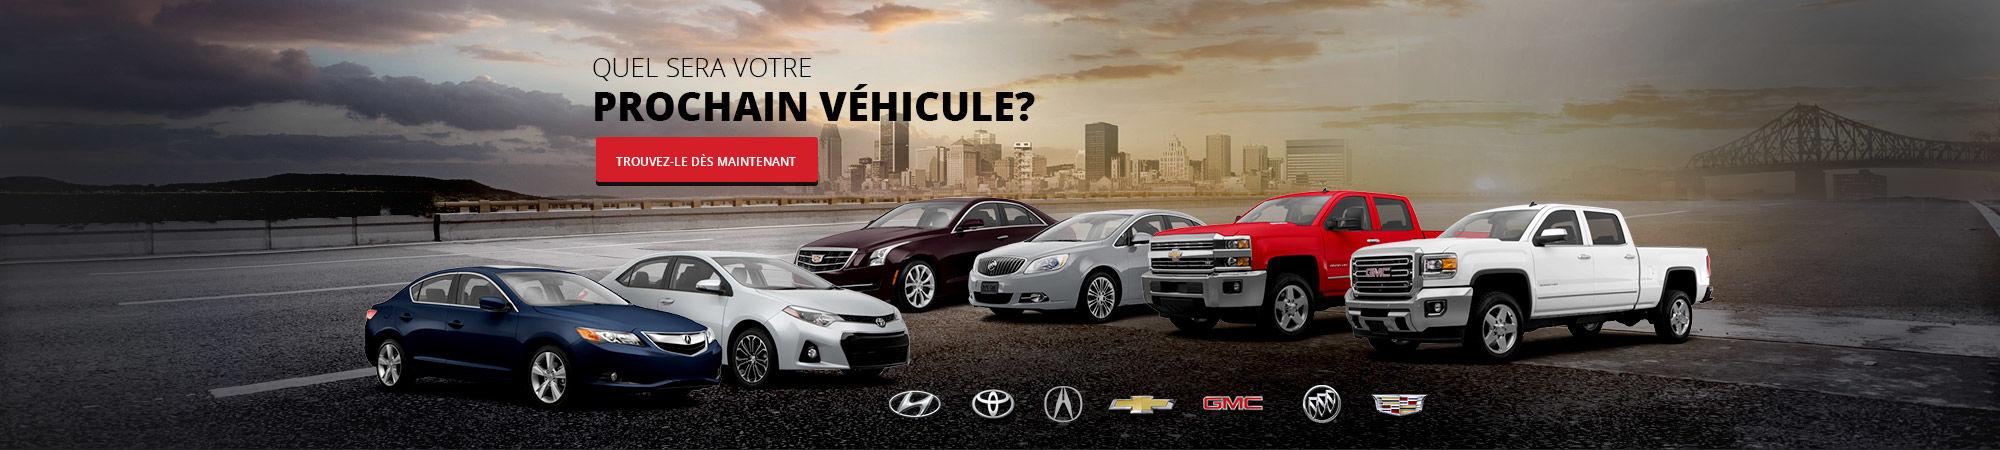 Quel sera votre prochain véhicule?